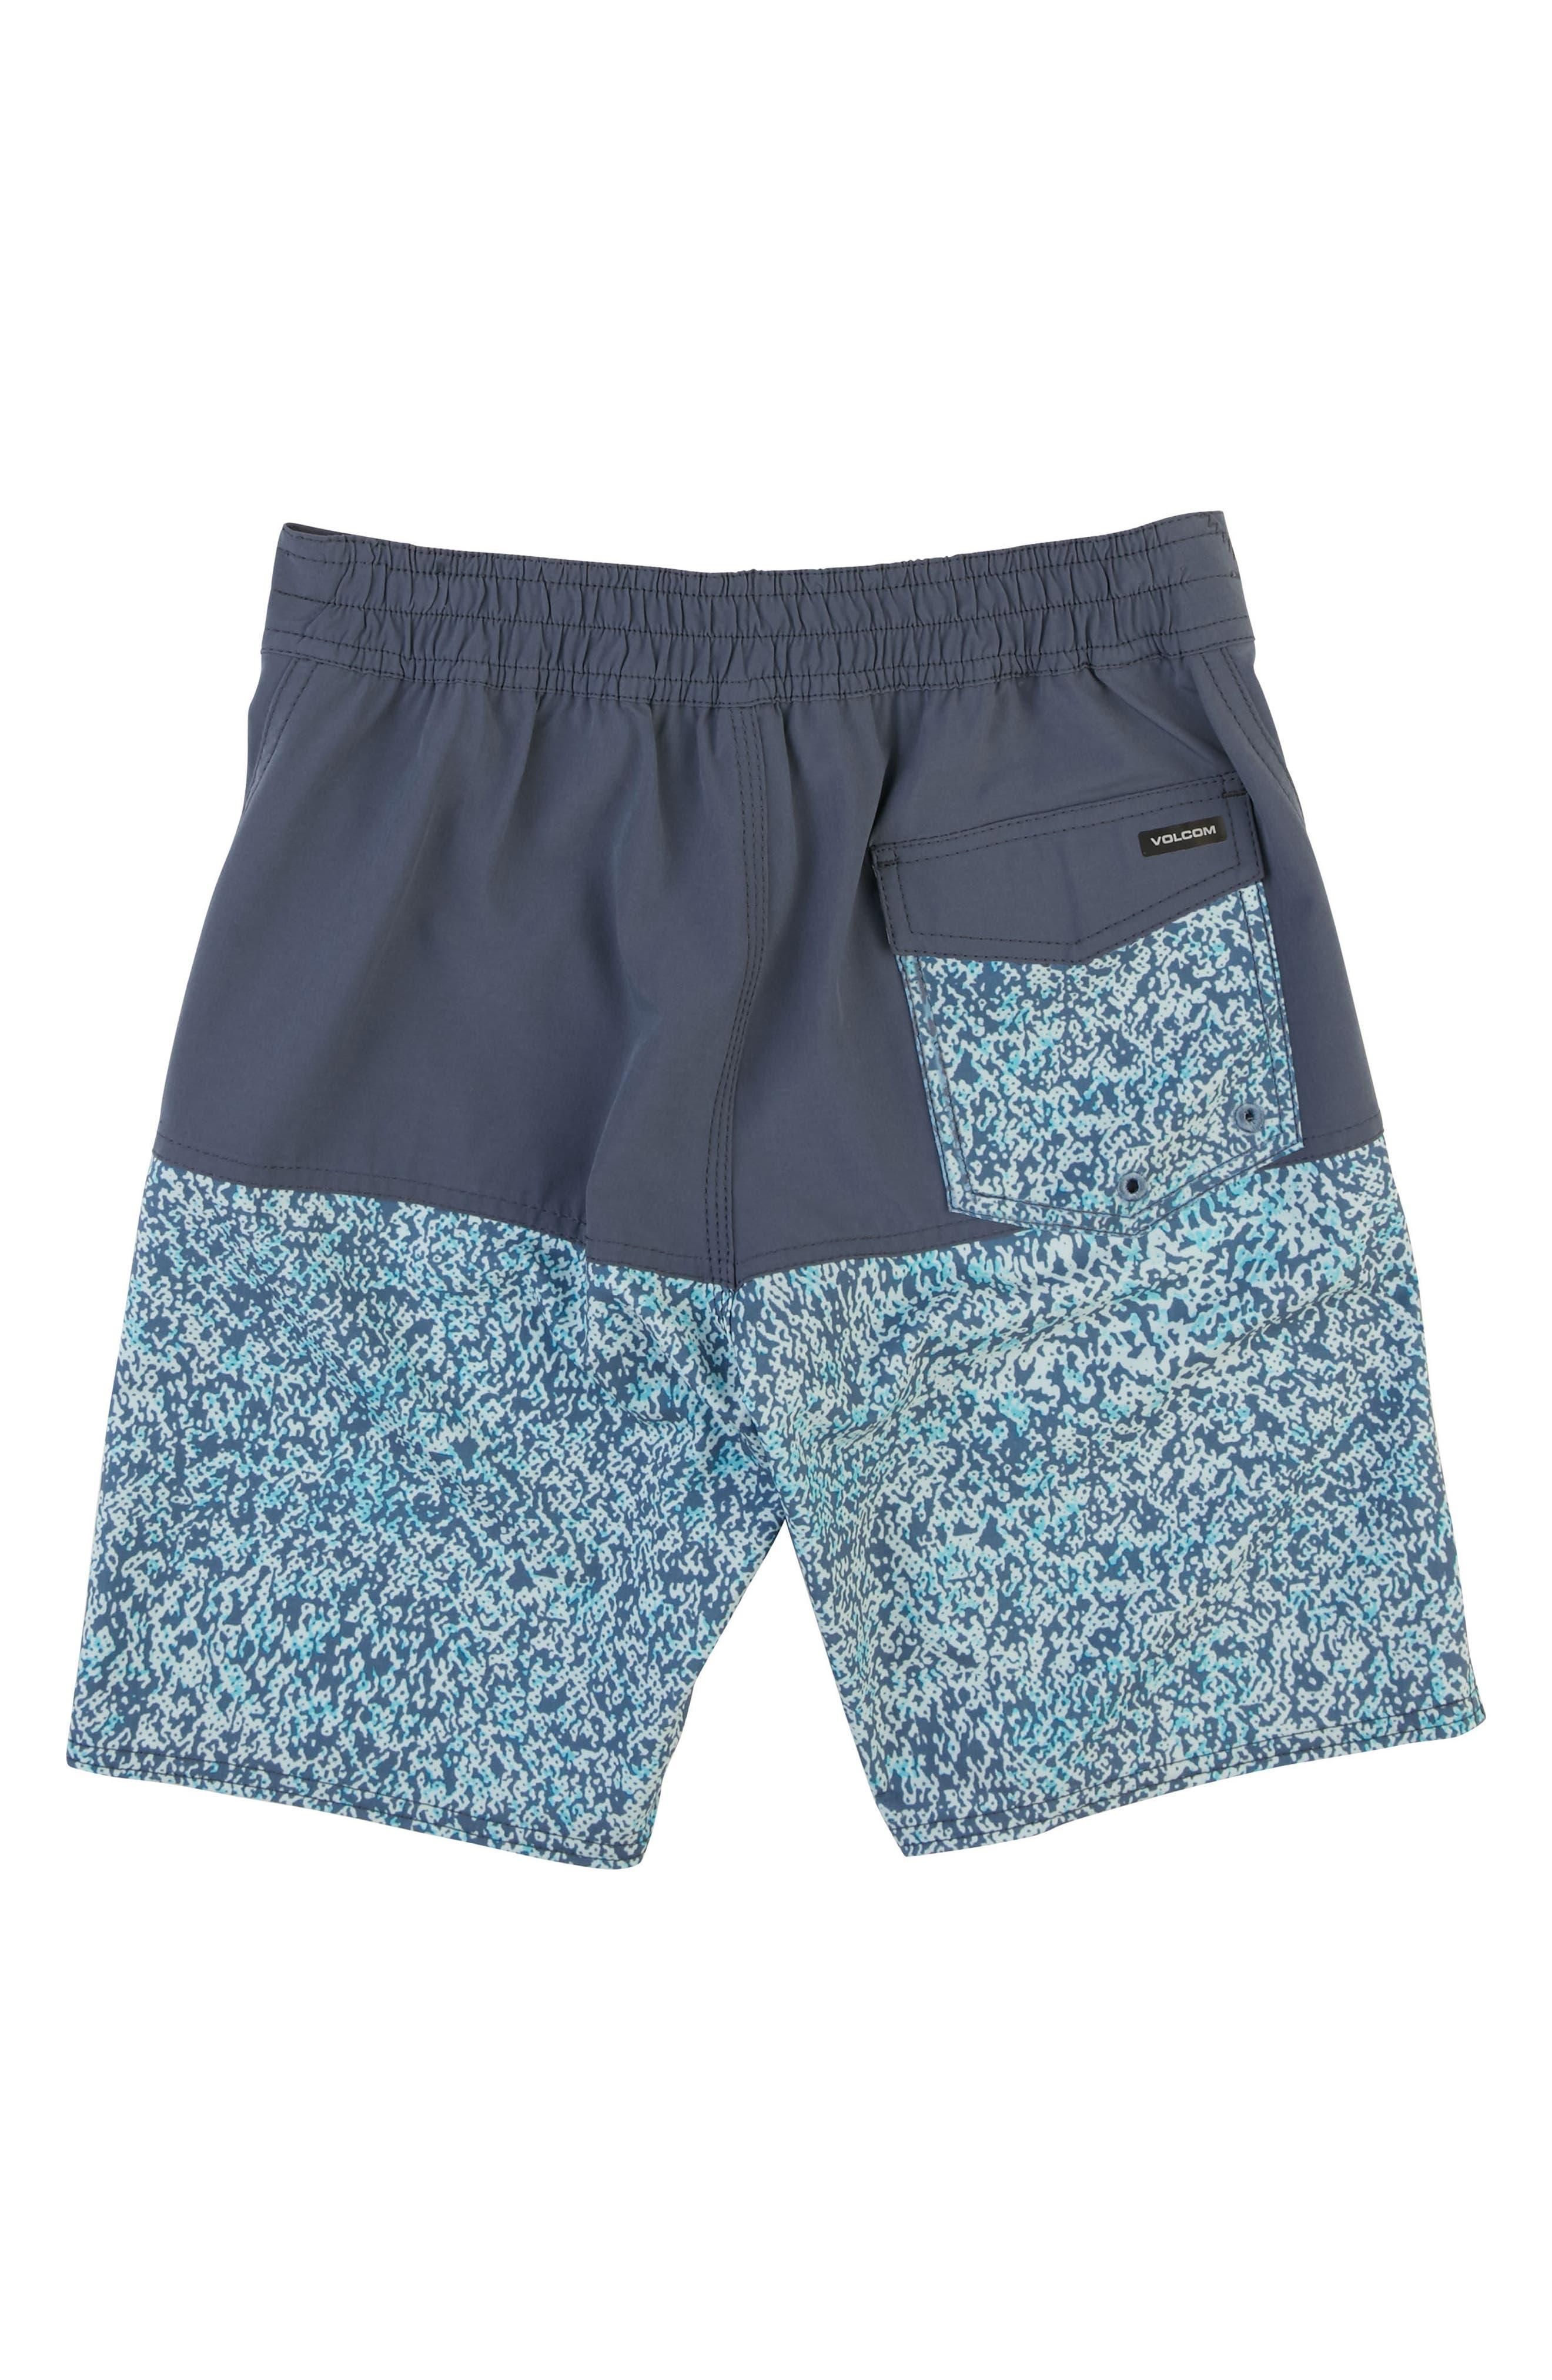 Vibes Board Shorts,                             Alternate thumbnail 2, color,                             Deep Blue